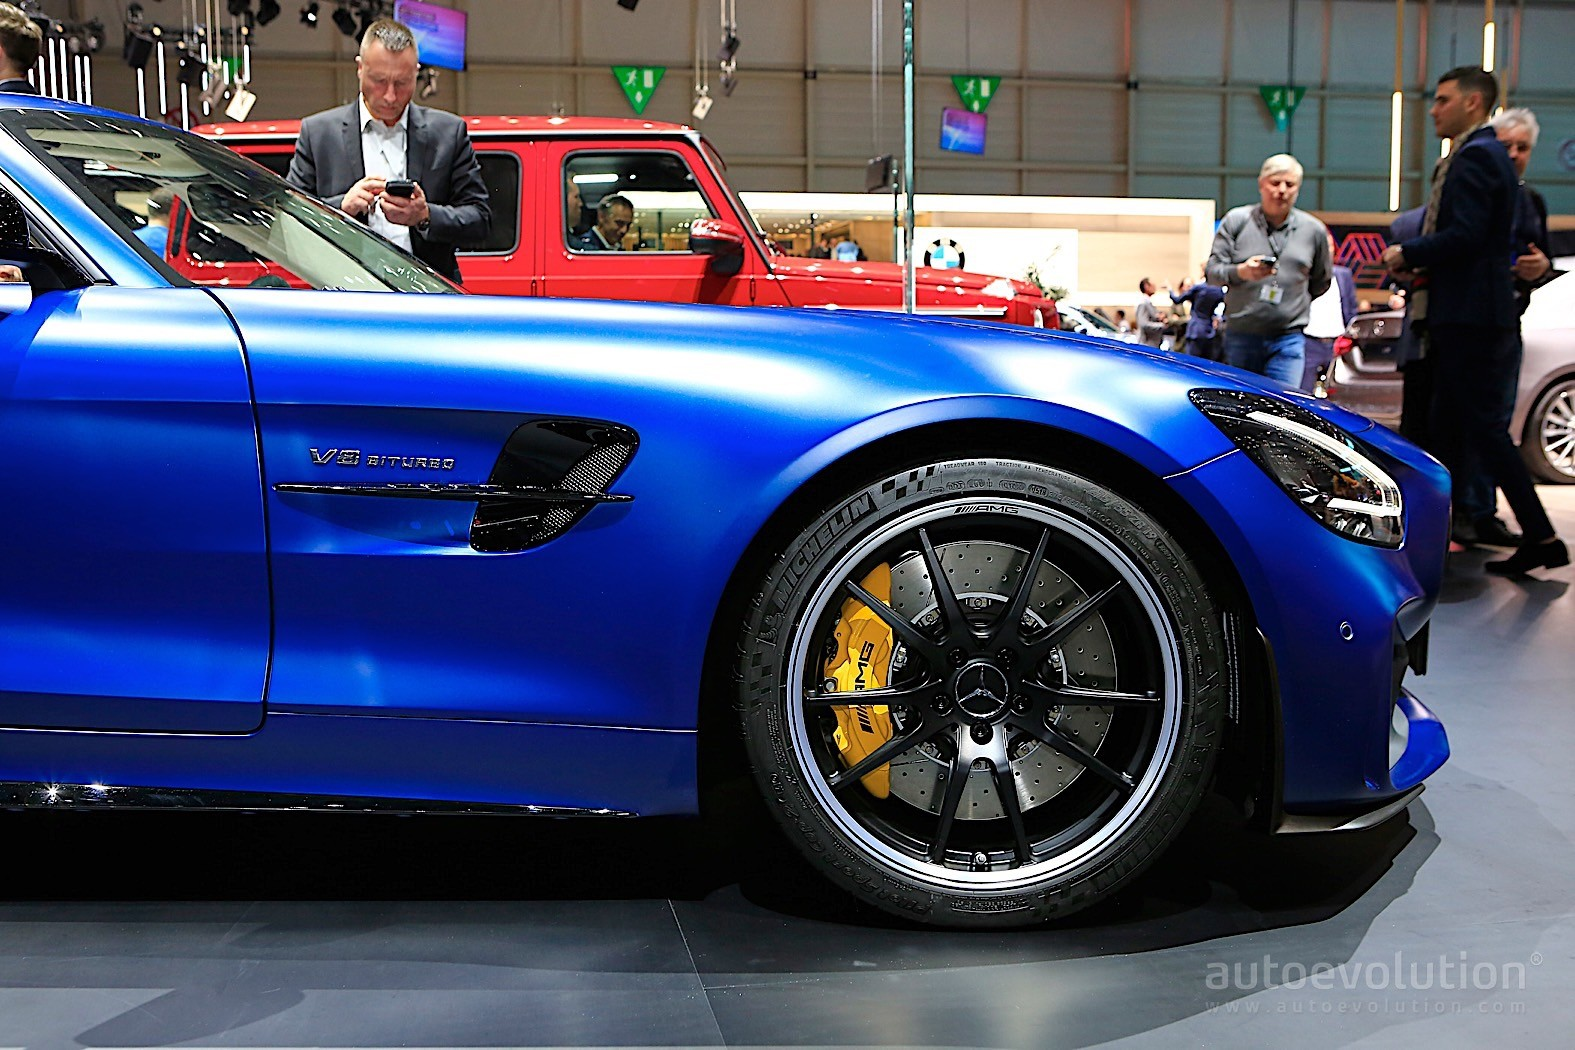 2020 mercedes amg gt r roadster looks blue in geneva autoevolution. Black Bedroom Furniture Sets. Home Design Ideas